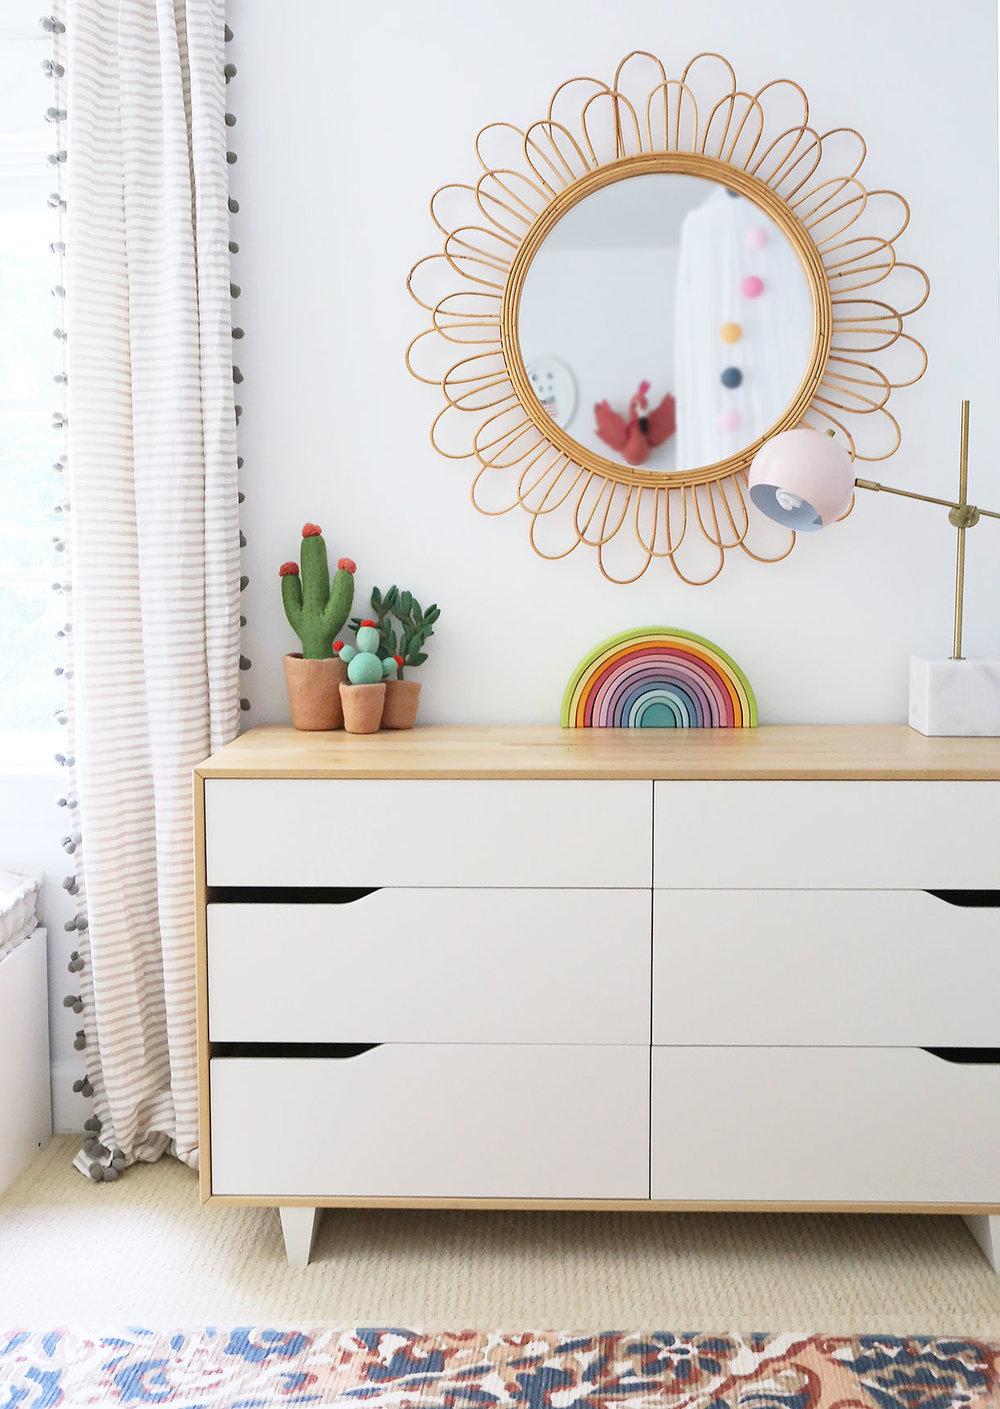 zora-bedroom-3-blog.jpg